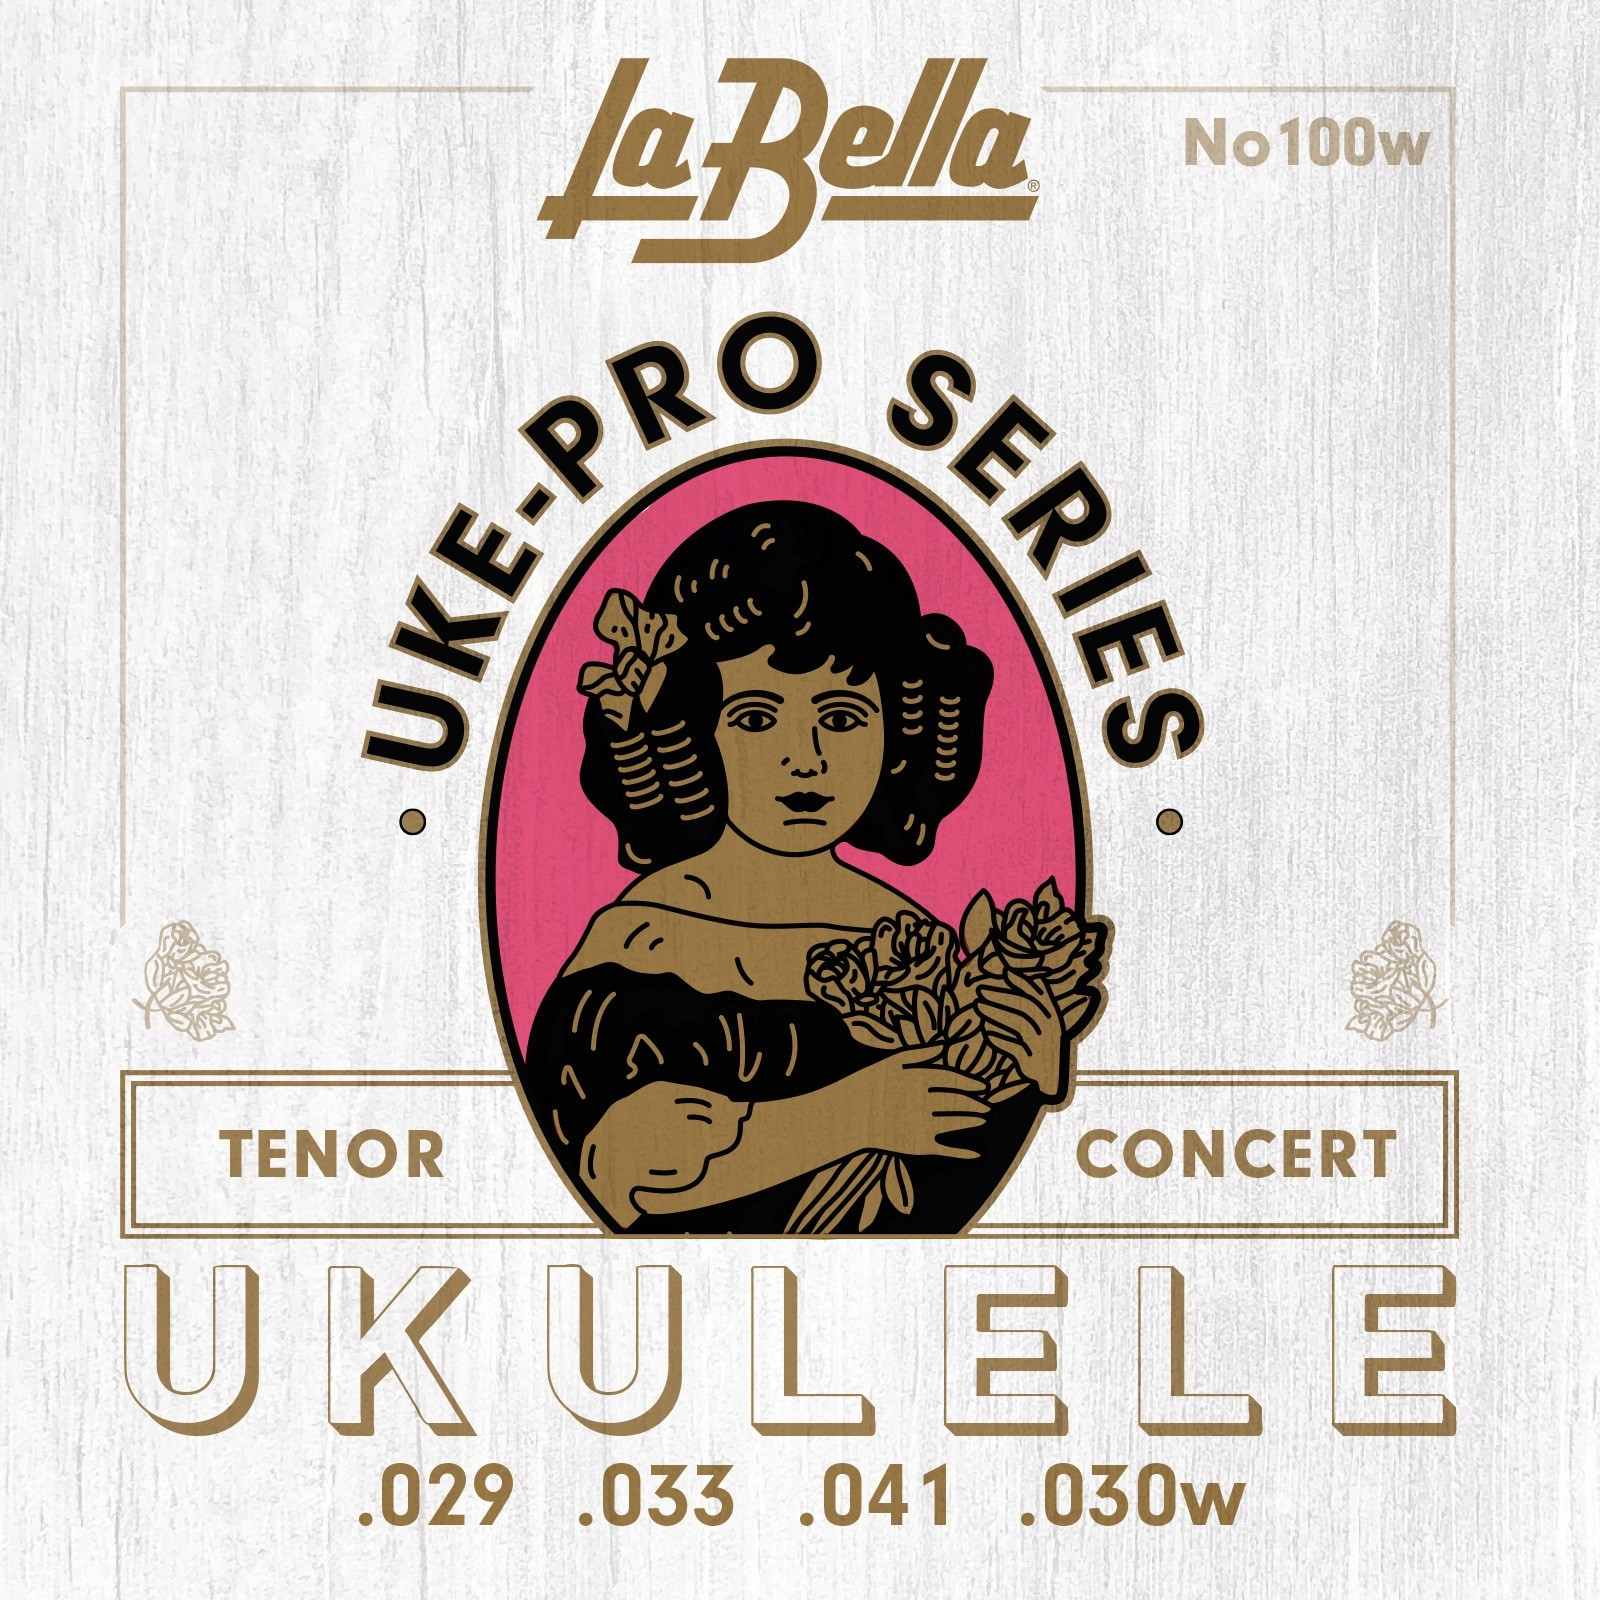 LaBella No.100w Struny do ukulele koncert / tenor